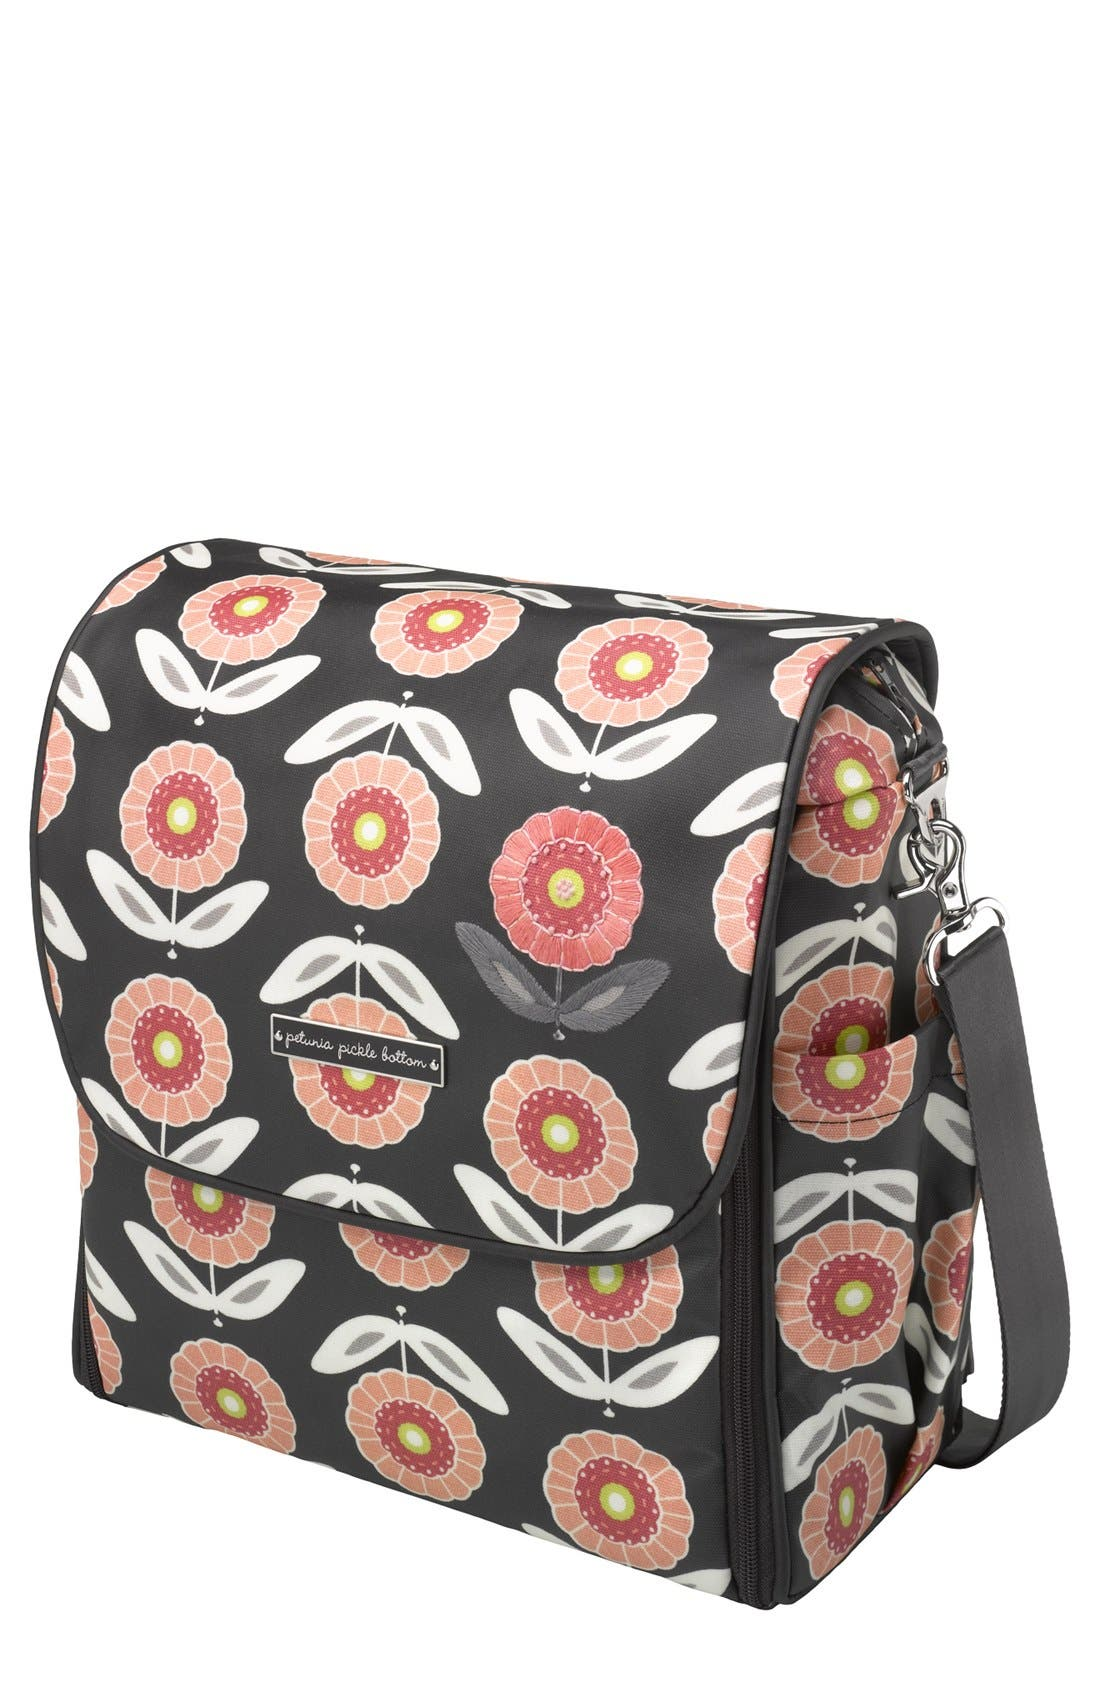 Main Image - Petunia Pickle Bottom 'Boxy Glazed' Backpack Diaper Bag